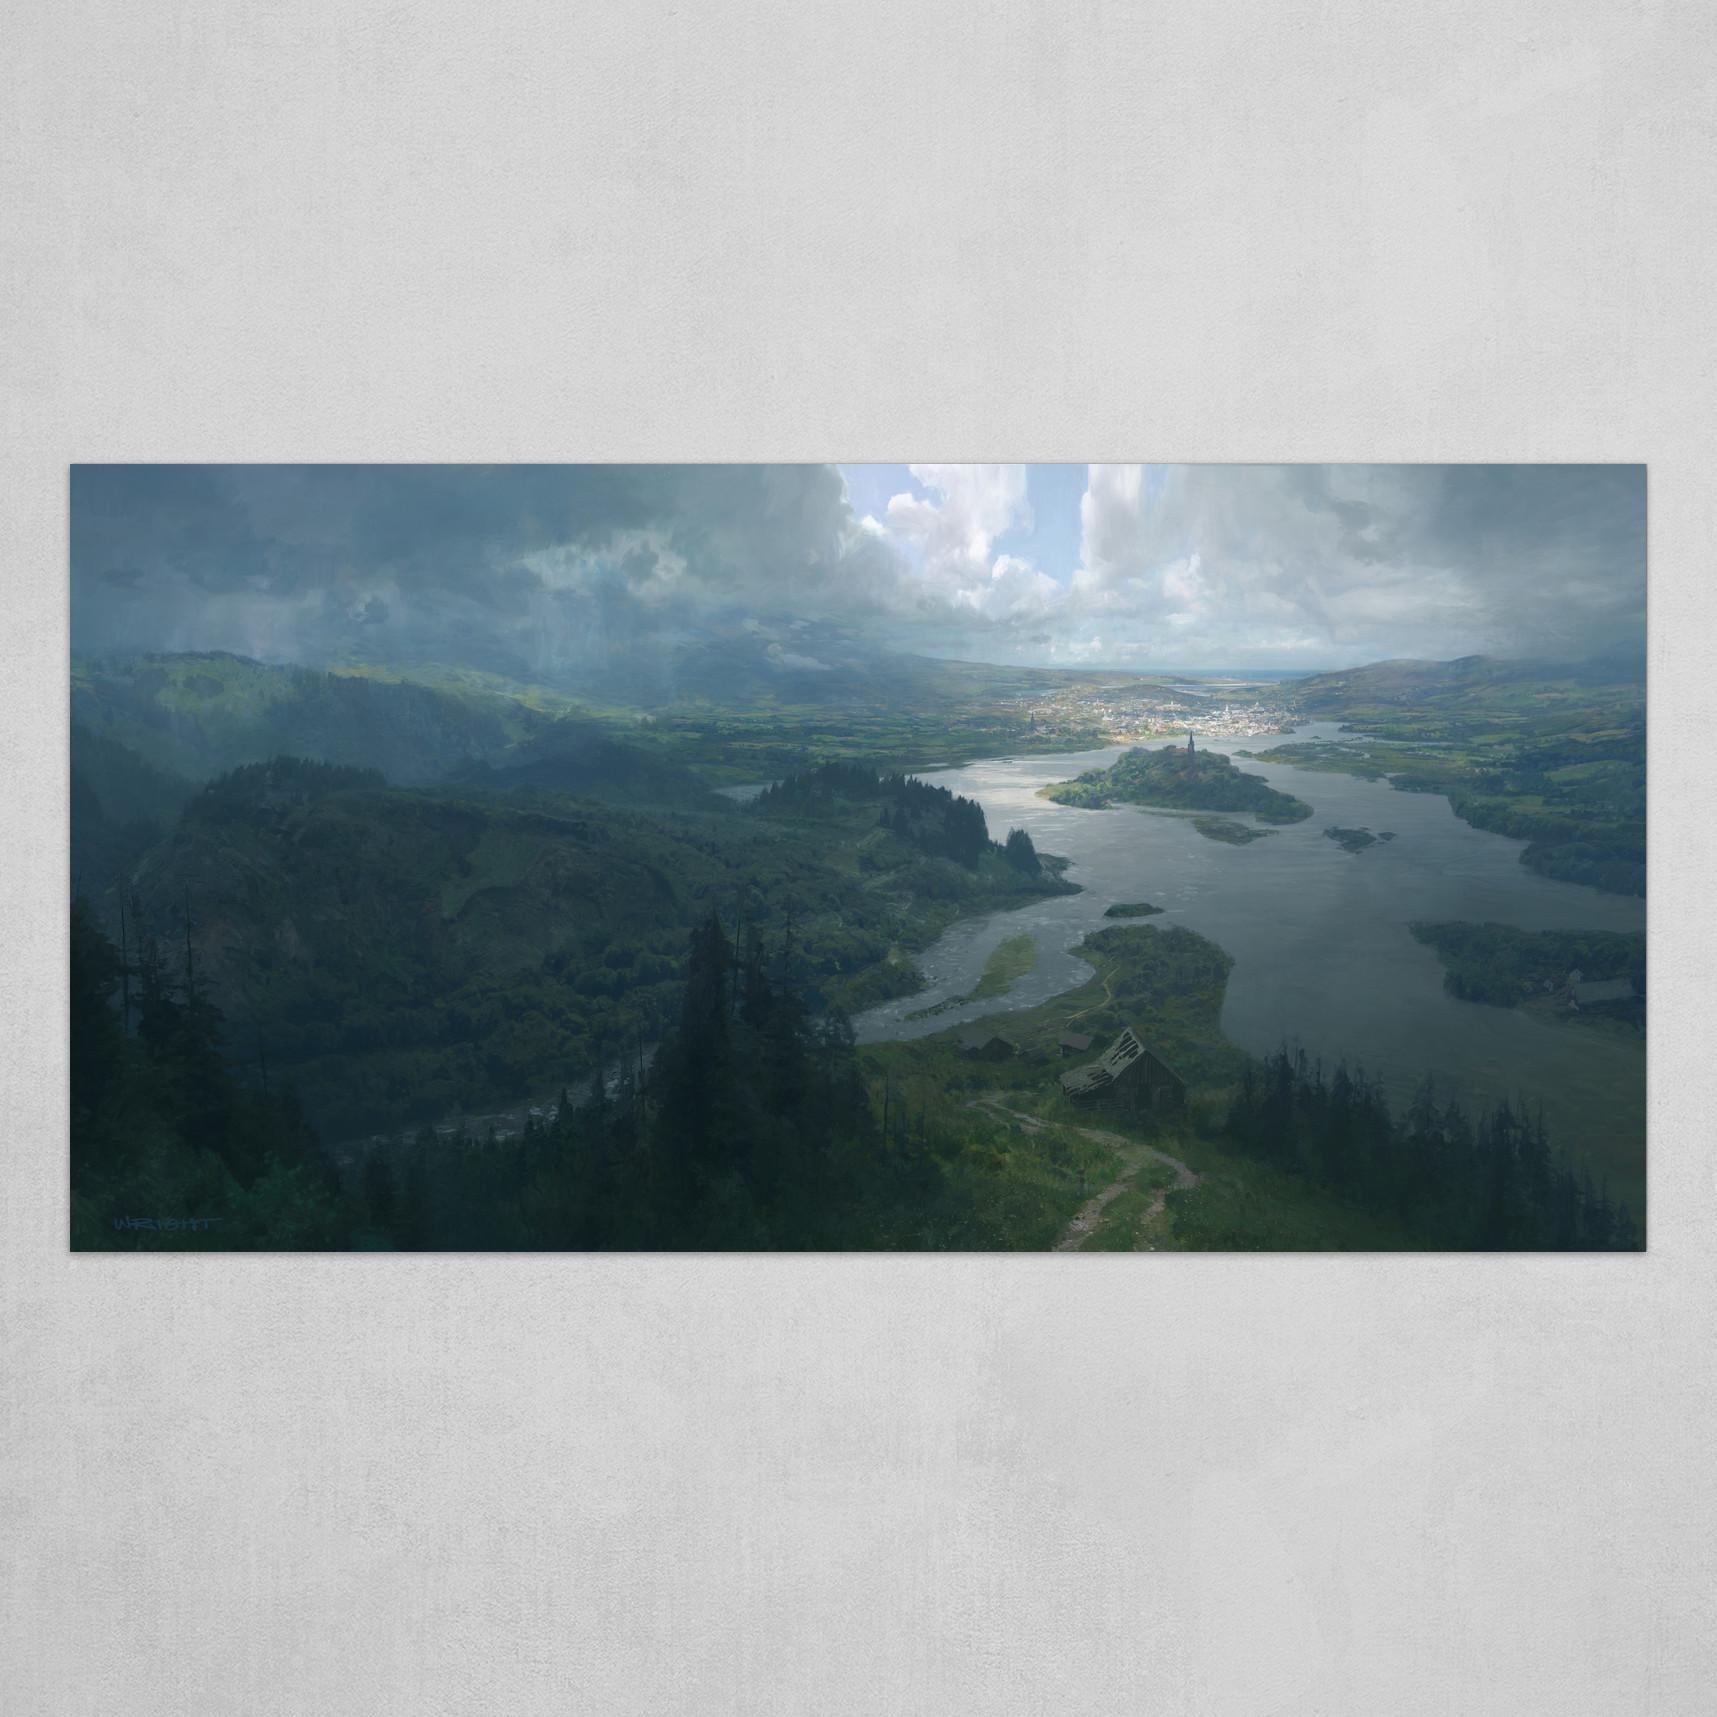 Arkham (2:1)